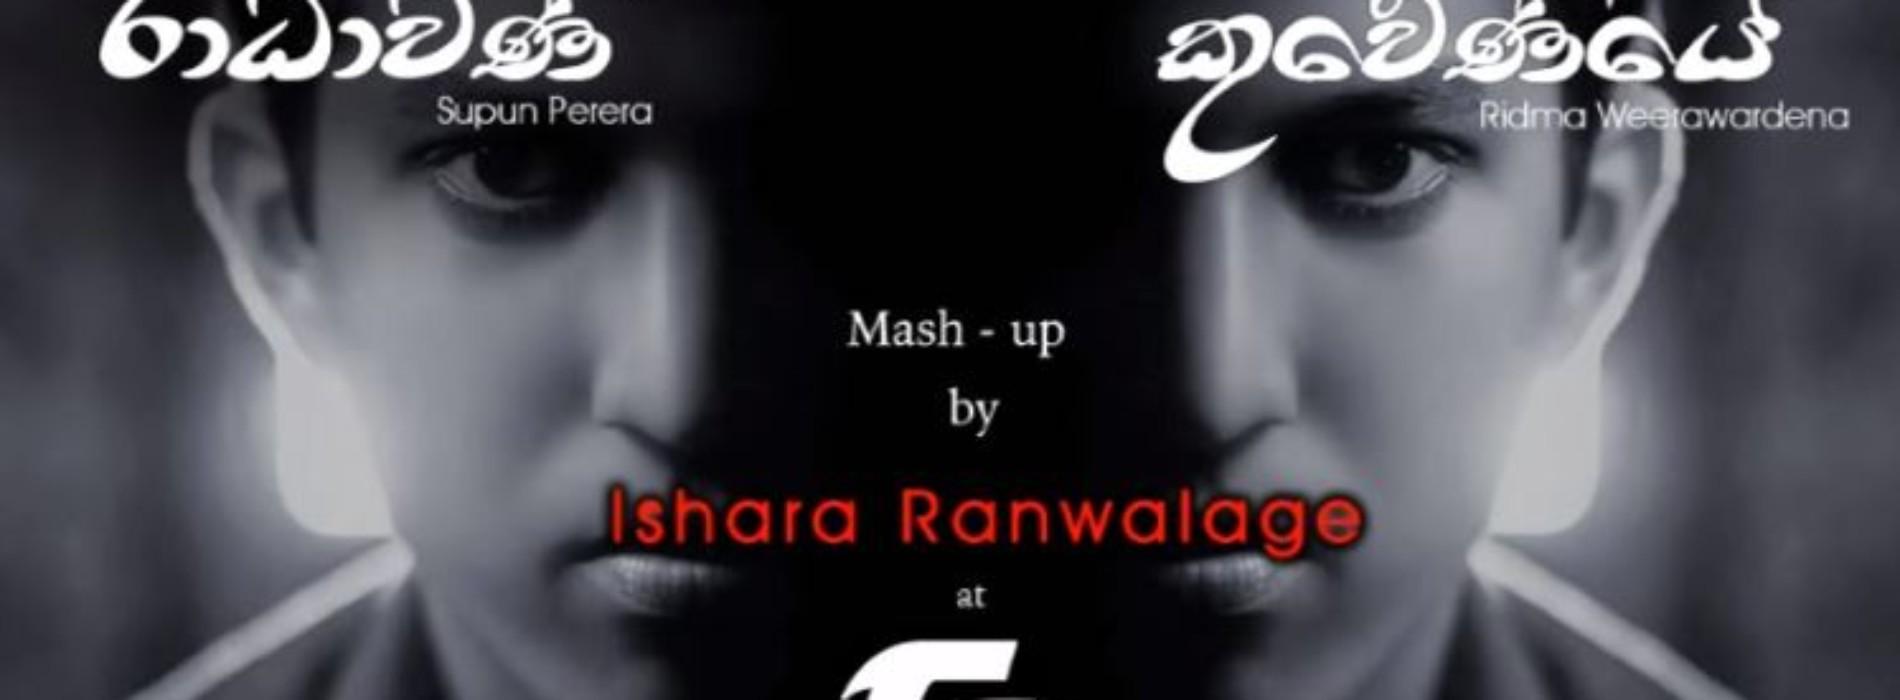 Ishara Ranwalage – Radhawani Kuweniye Mashup